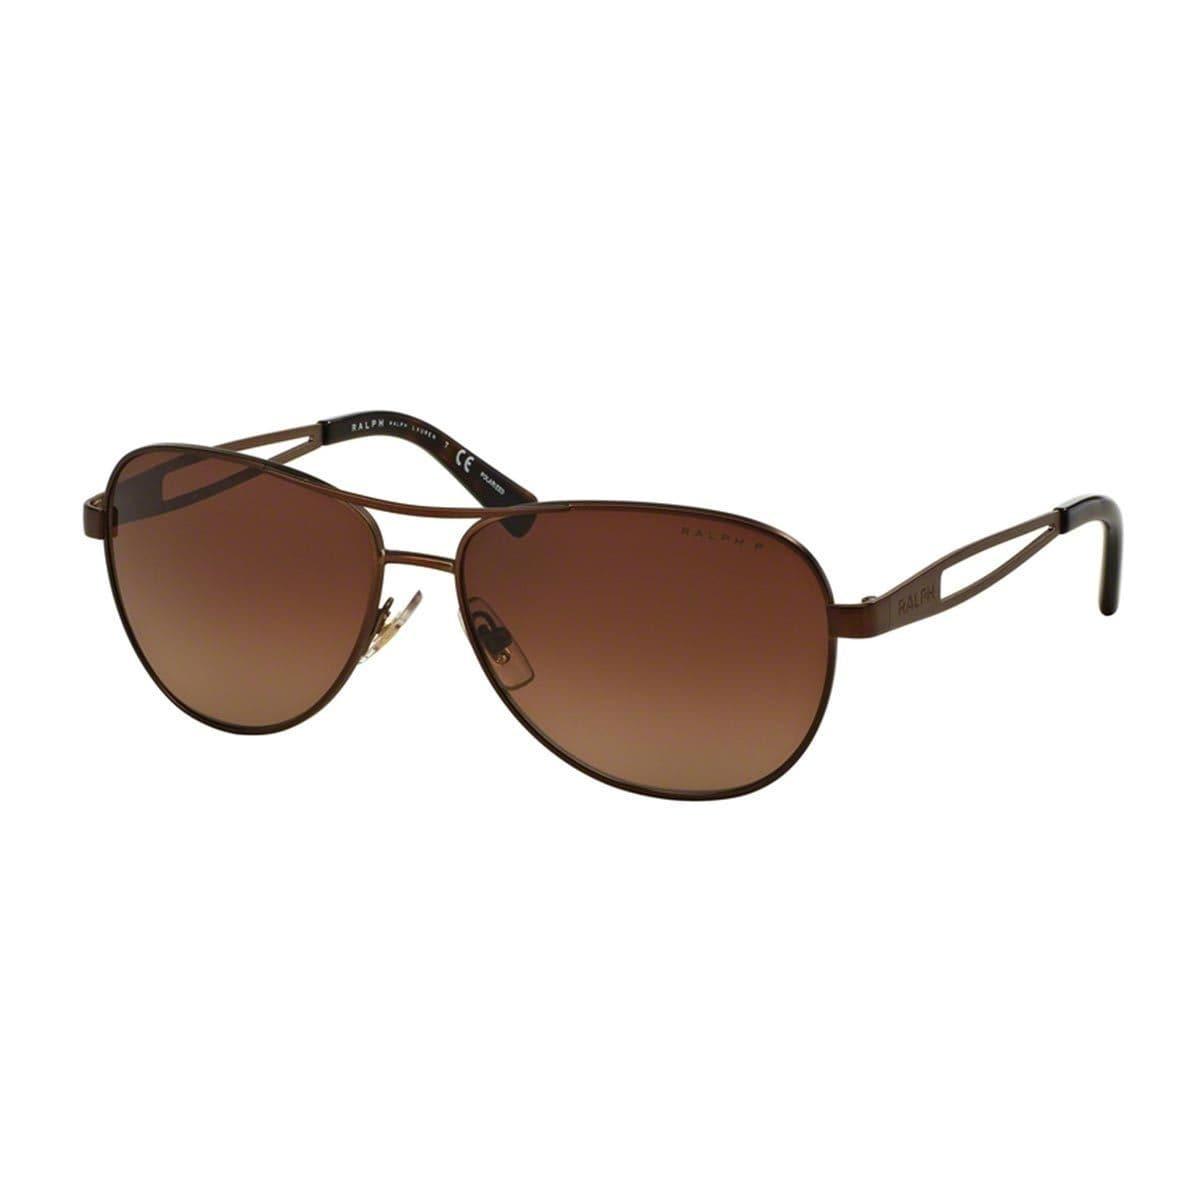 1ed46d37e50 Shop Ralph by Ralph Lauren Women s RA4115 3101T5 Brown Metal Pilot  Polarized Sunglasses - Free Shipping Today - Overstock - 10857637